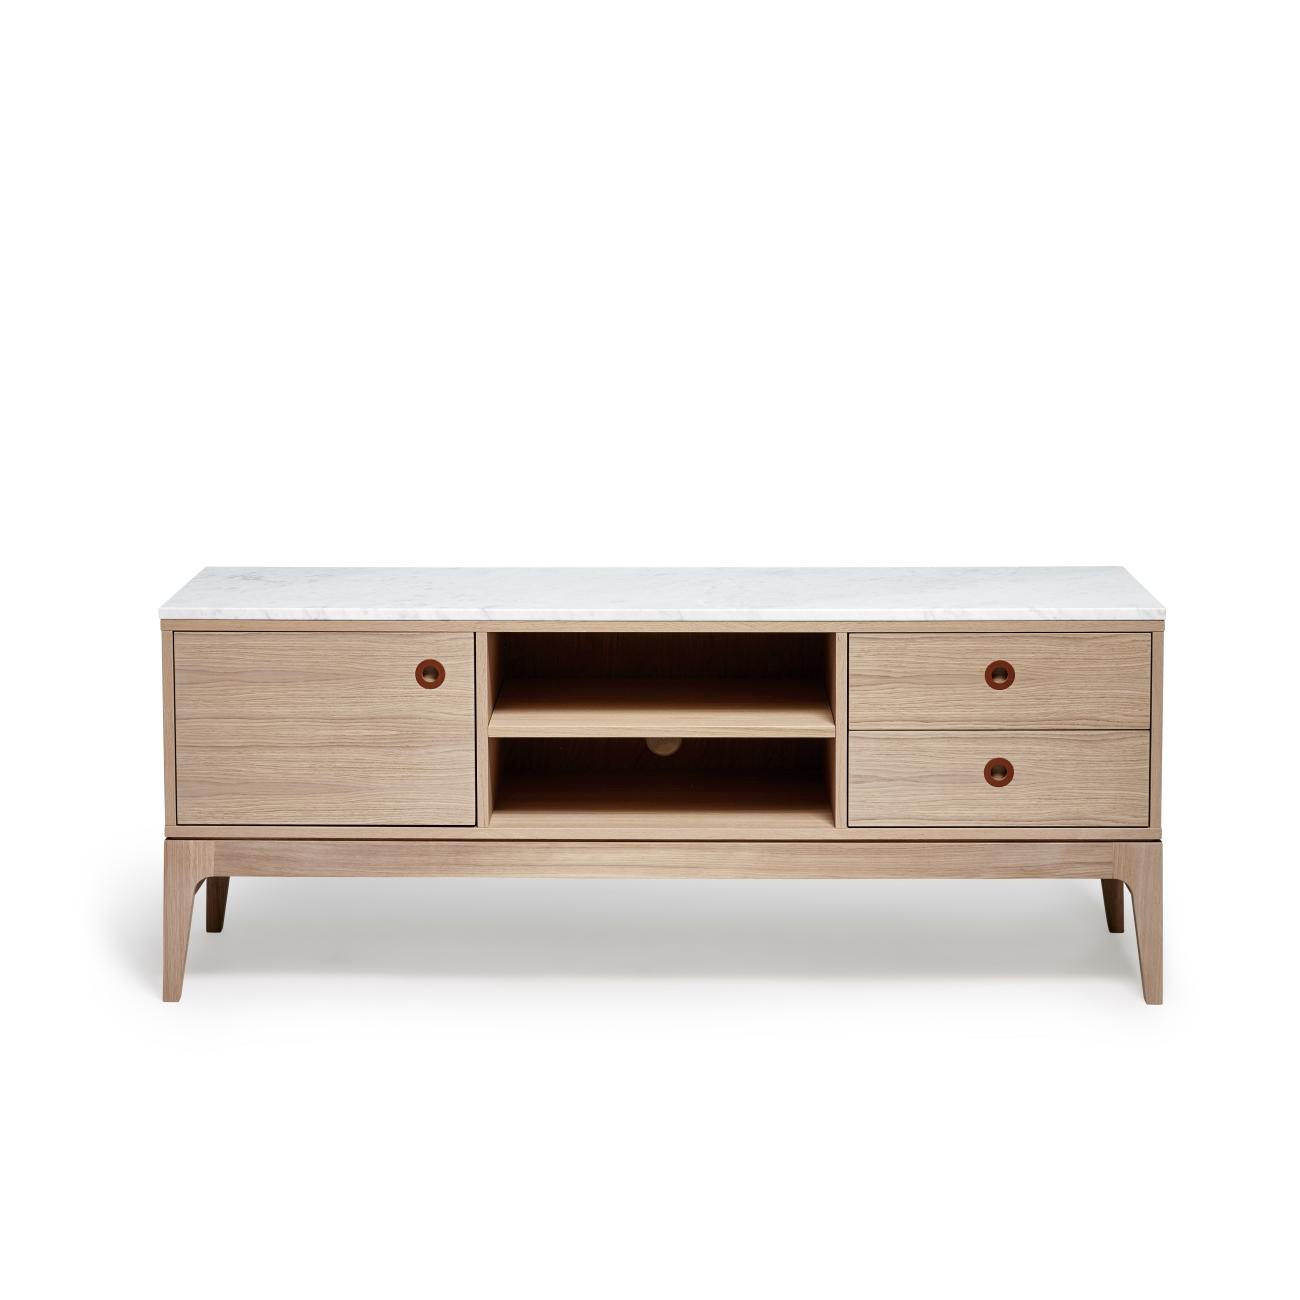 Höllviken TV-bänk 150 cm  ek/ marmor, Mavis